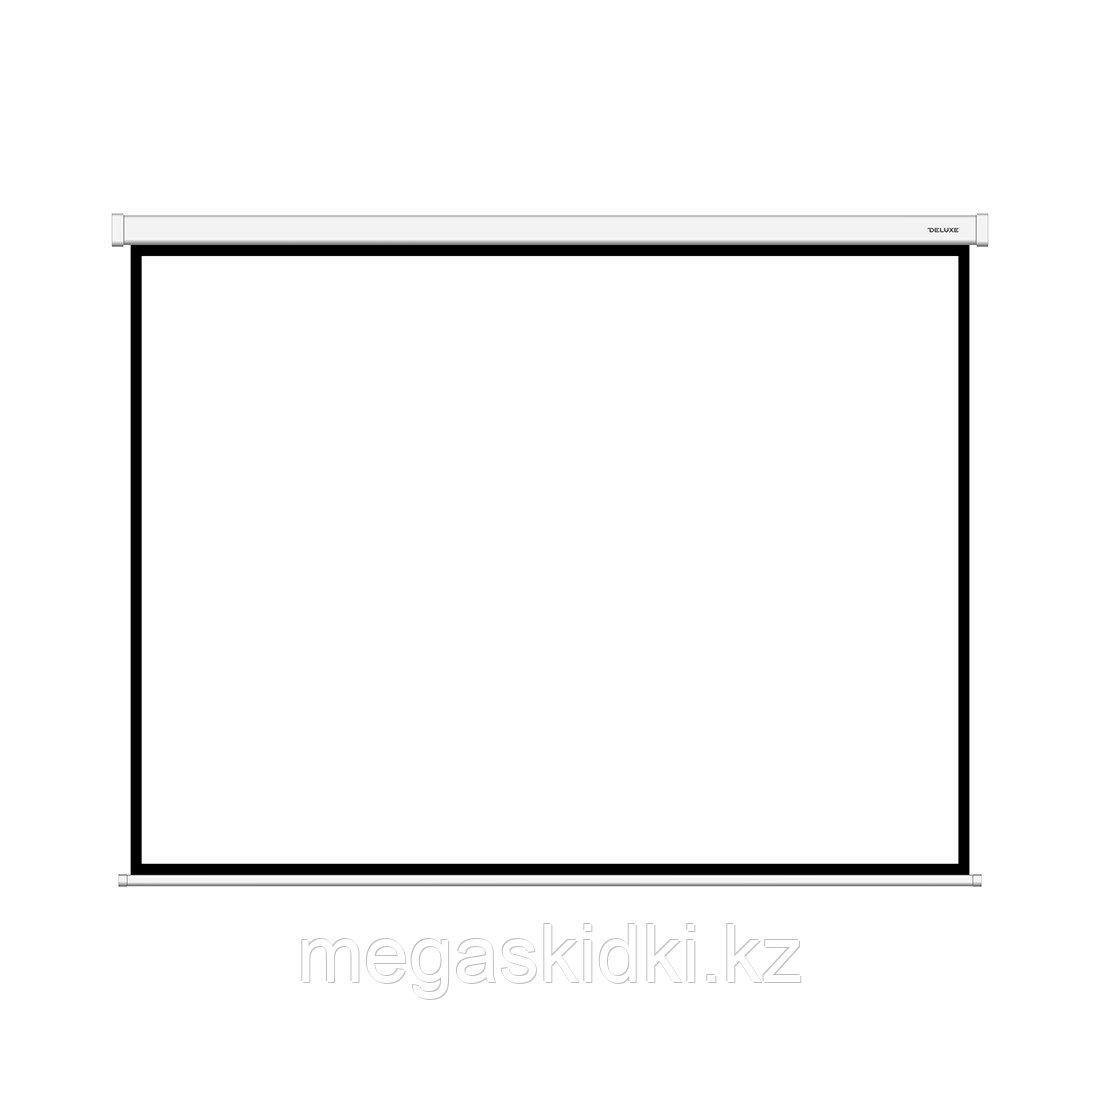 Экран для проектора Deluxe DLS-M203x153W